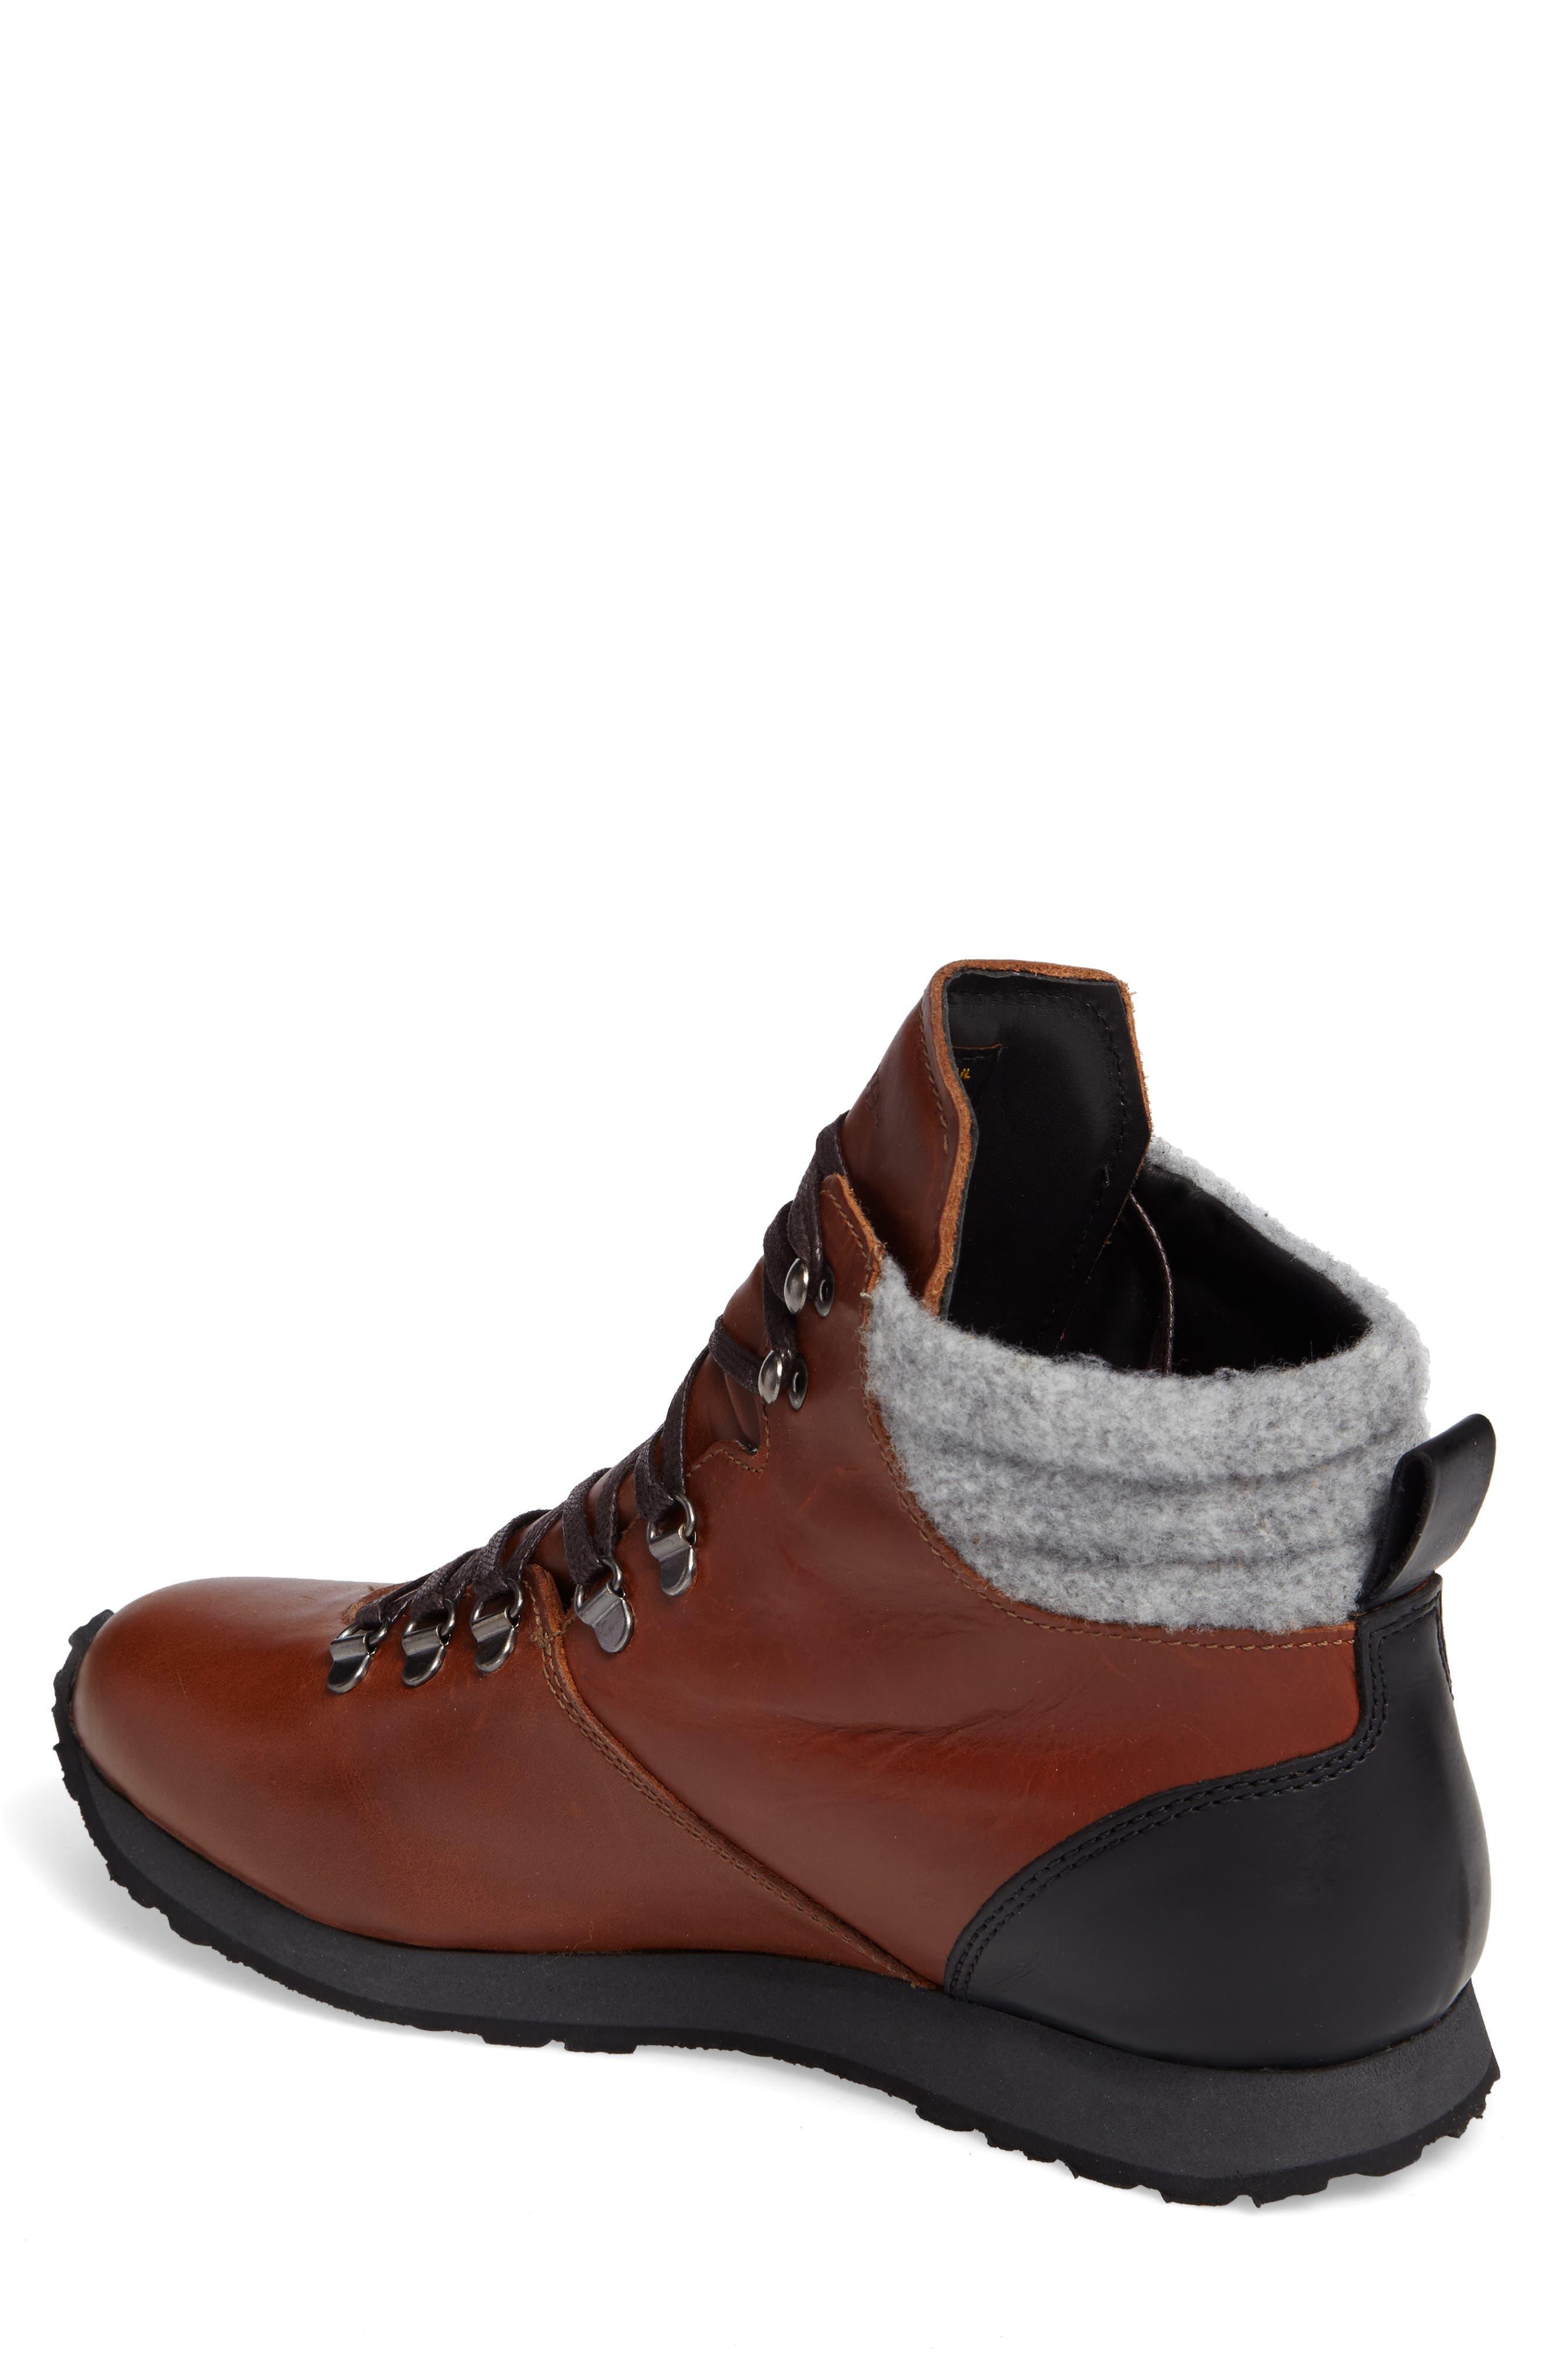 Alternate Image 2  - Hood Rubber Concord Mid Top Wool Cuffed Waterproof Boot (Men)